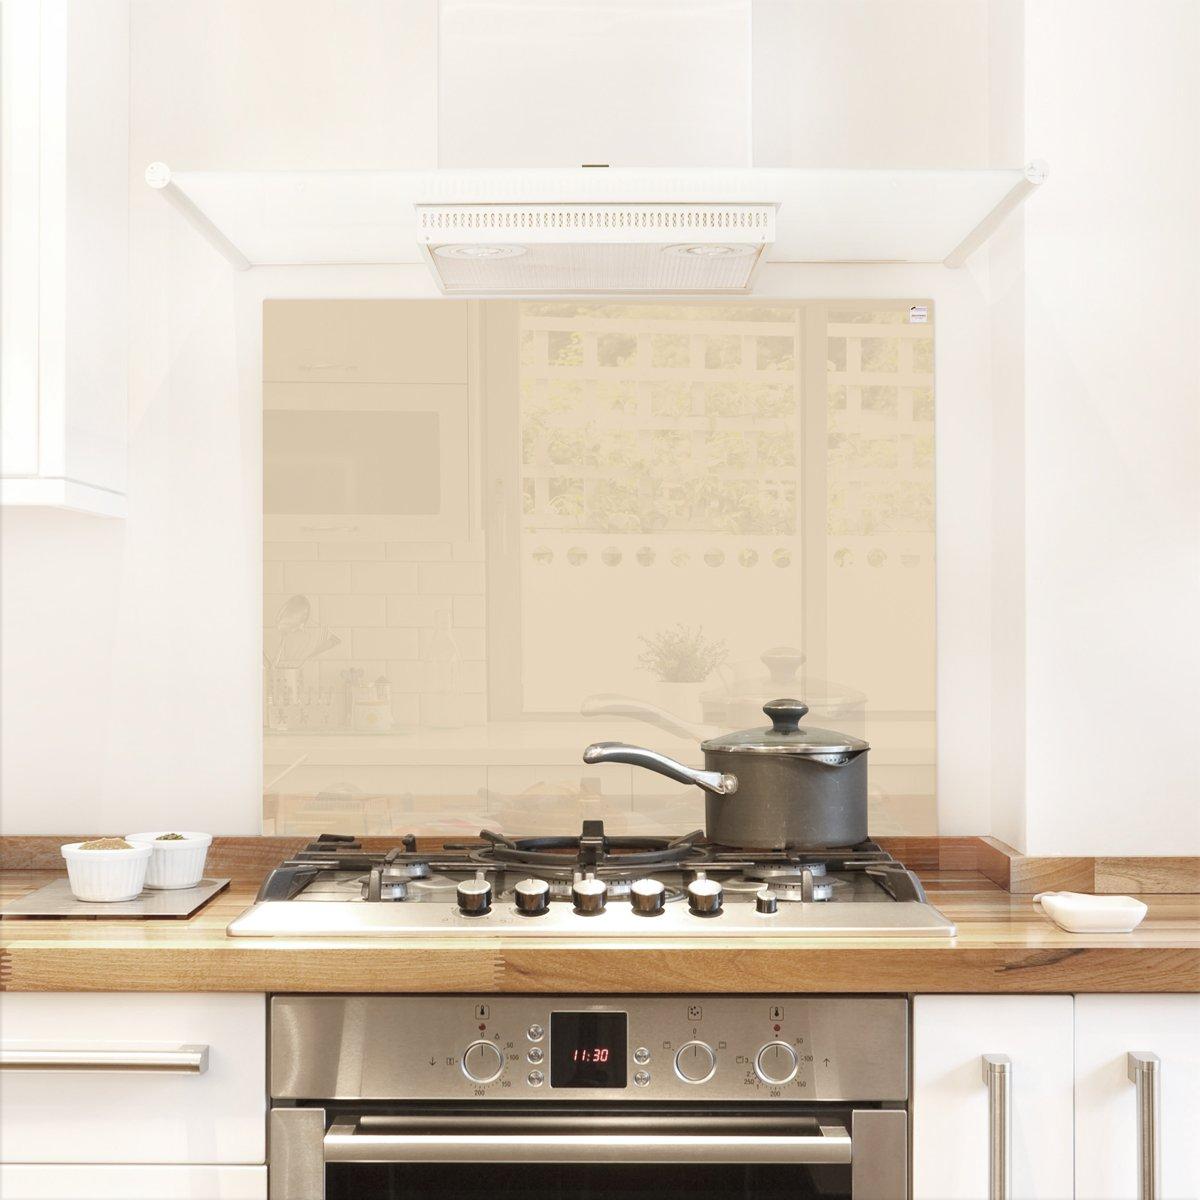 Rinnovare paraschizzi cucina paraschizzi cucina l utile anche di tendenza with rinnovare - Rinnovare piastrelle cucina ...